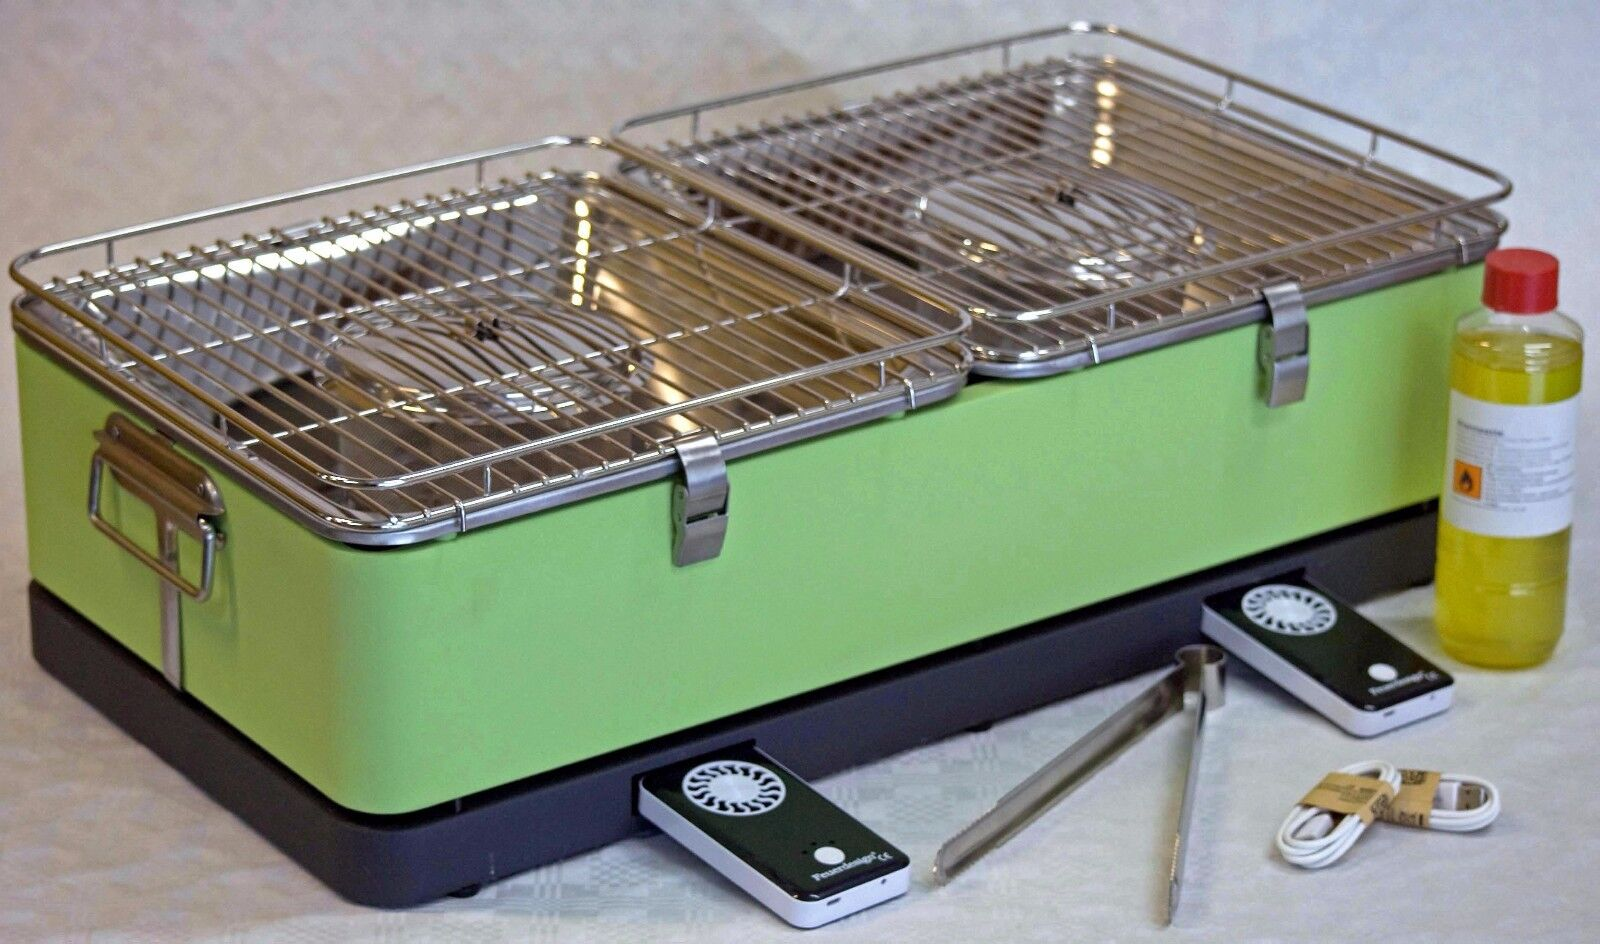 Rösle Gasgrill B Ware : Weber gasgrill b ware outdoor kitchens appliances kitchen